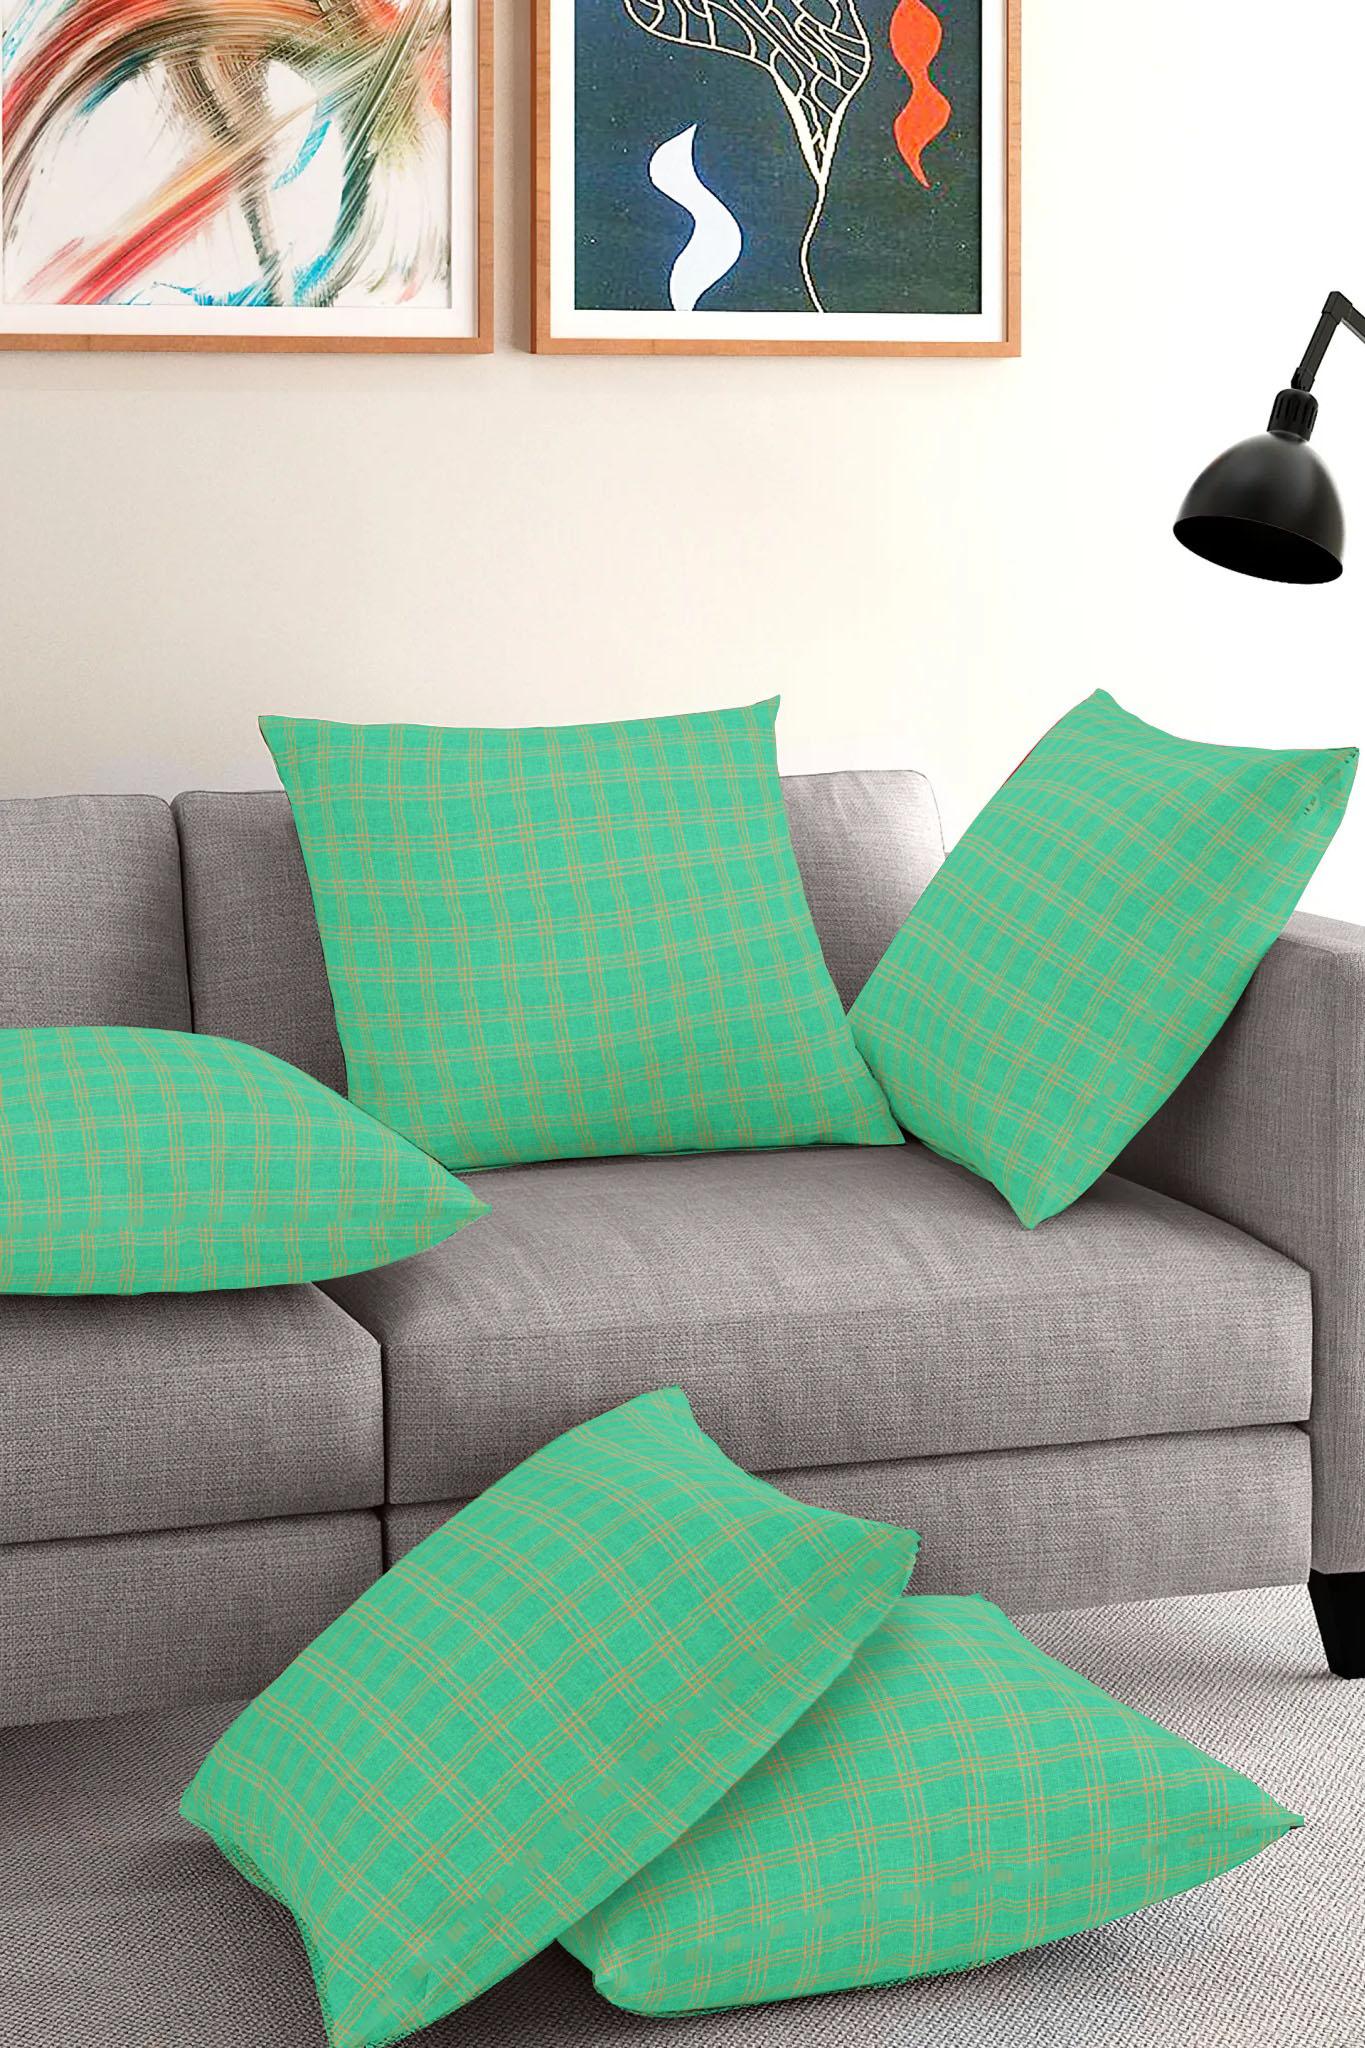 /home/customer/www/fabartcraft.com/public_html/uploadshttps://www.shopolics.com/uploads/images/medium/Green-Yellow-Cotton-Cushion-Cover-35397.jpg